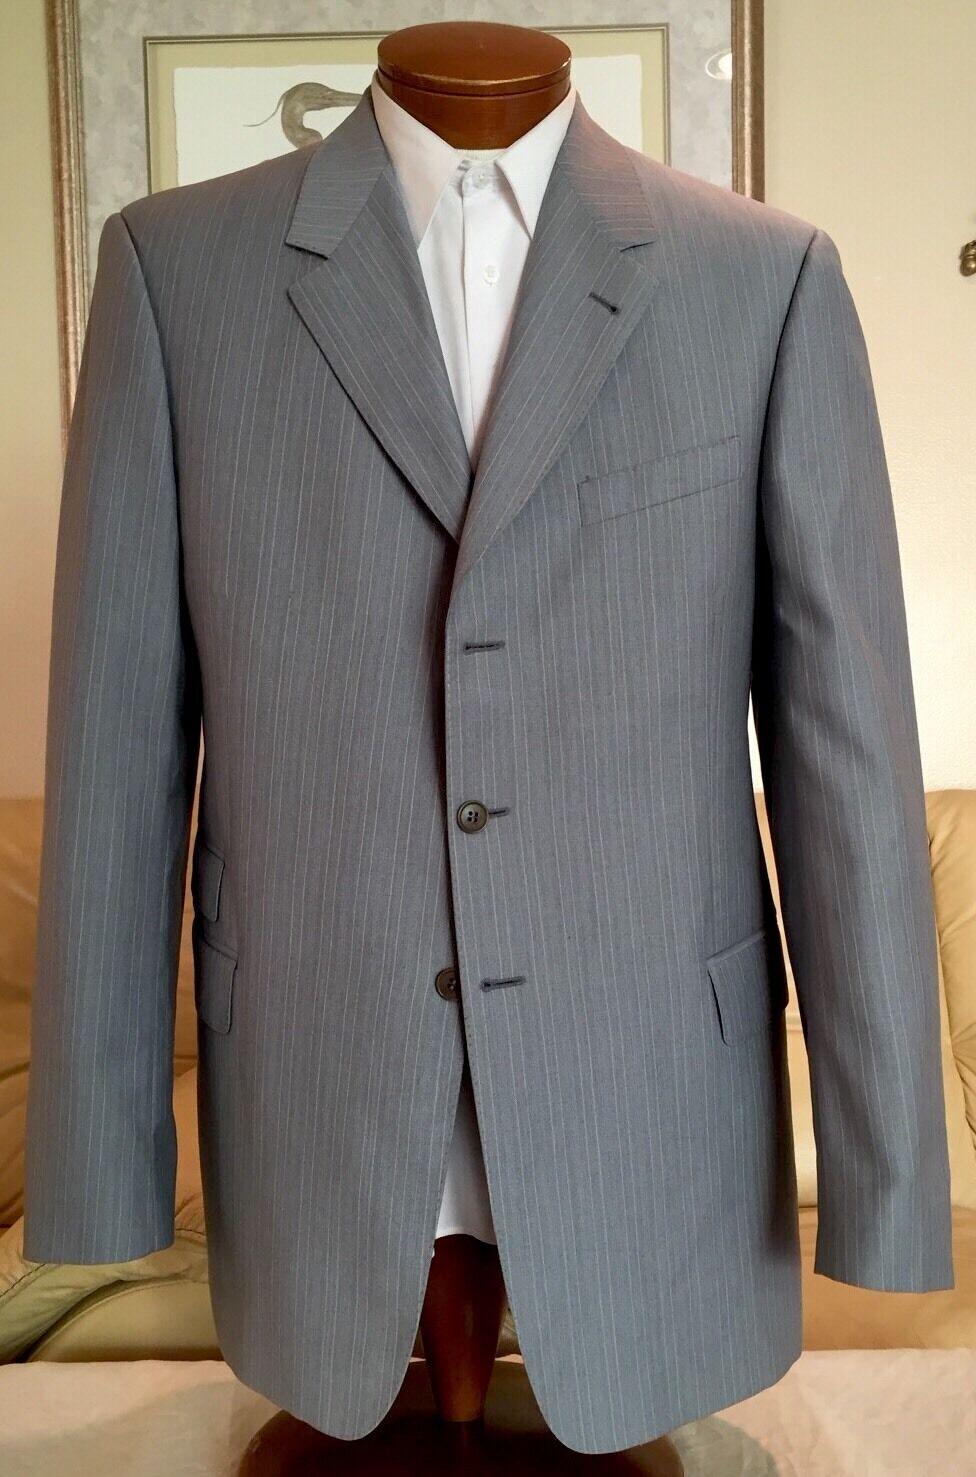 Paul Smith  Herren grau Stripe 3 Btn 2 Vent Wool Blazer Sz 42/44 L MINT